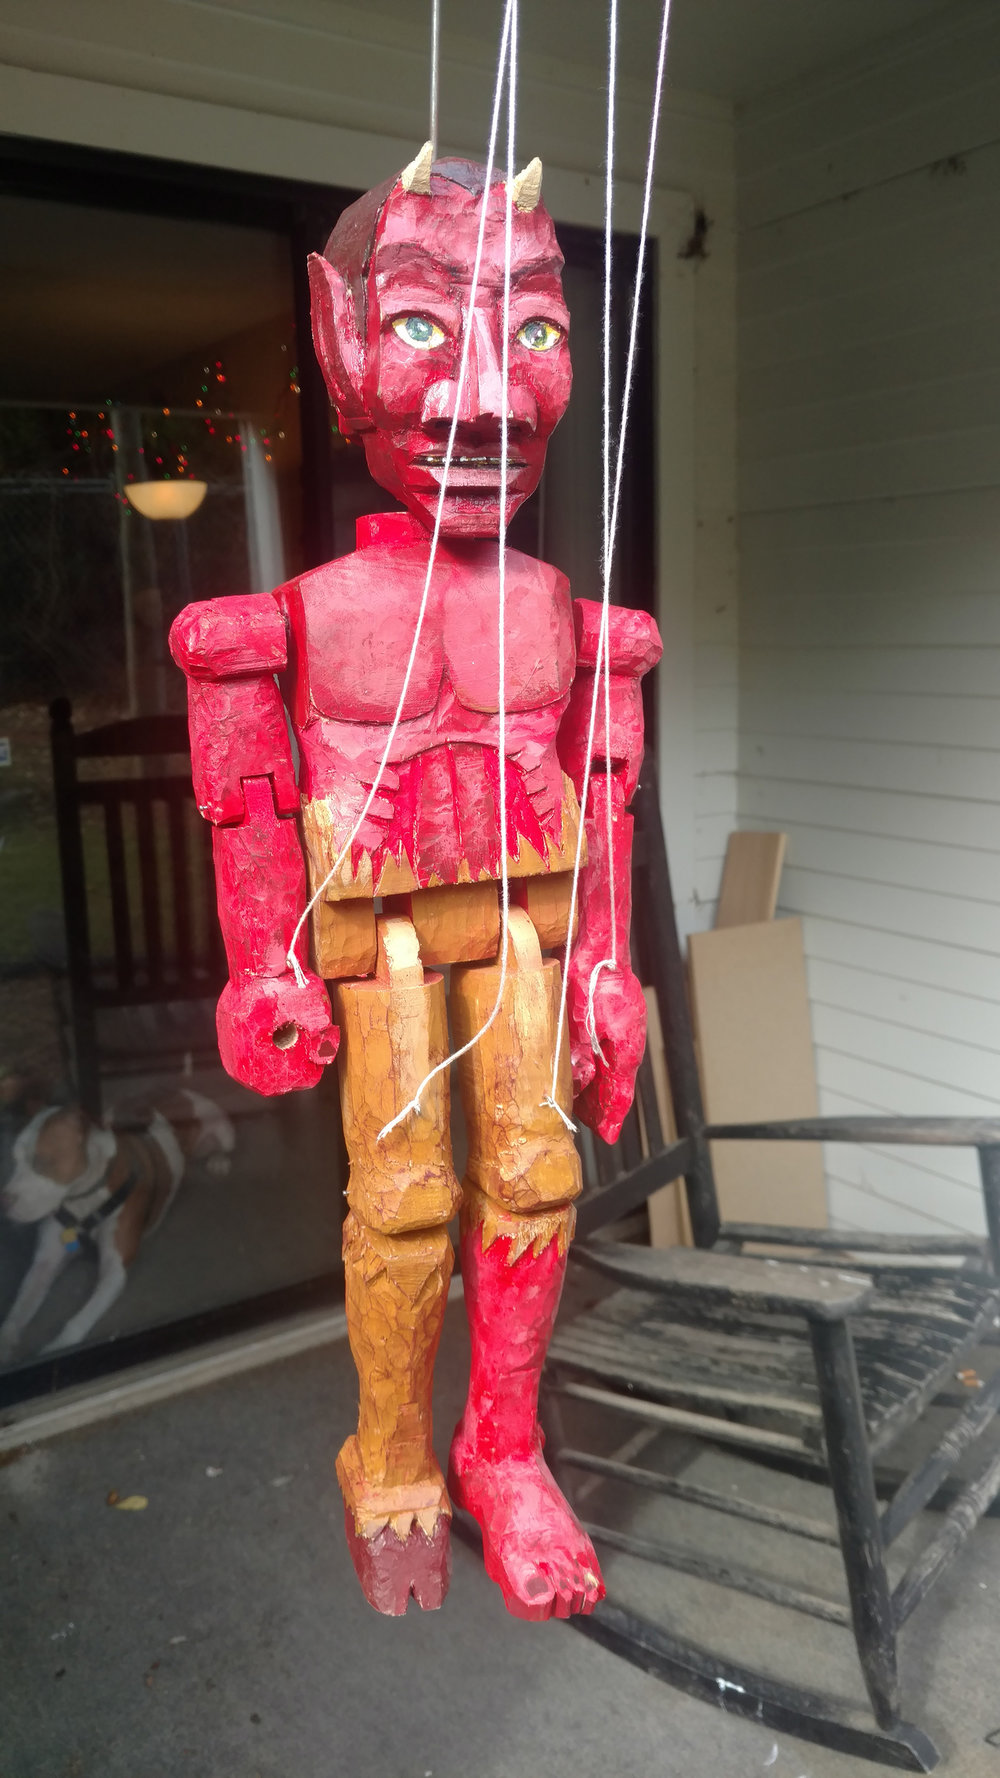 Devil Marionette, Wood and string, 2018